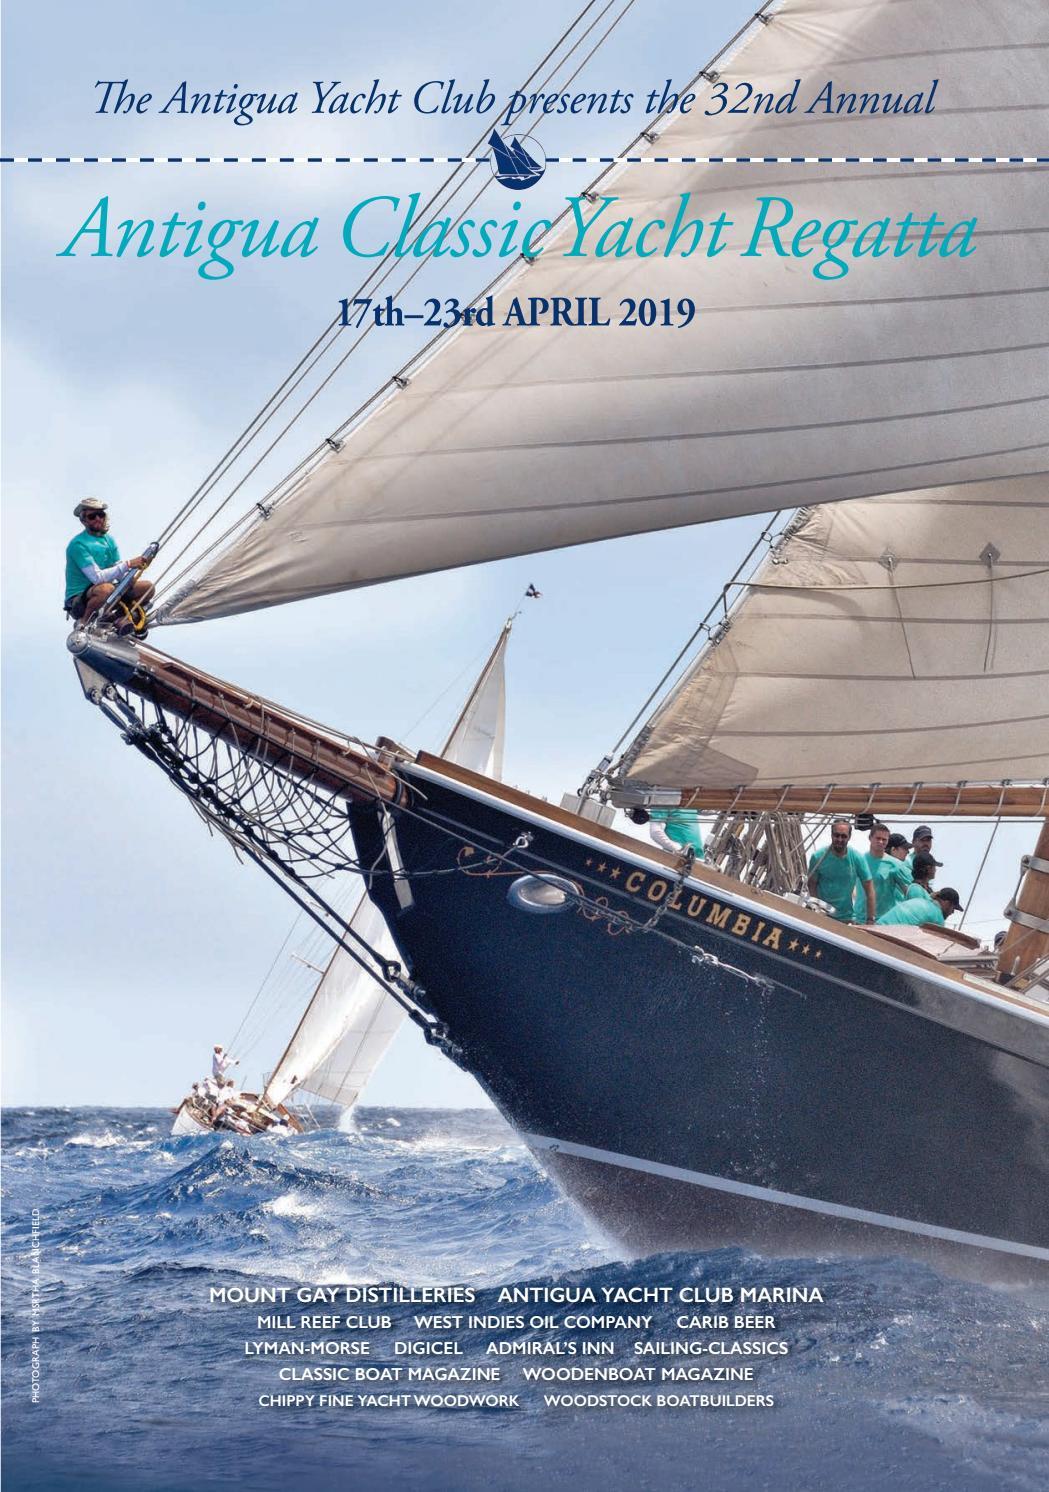 Antigua Classic Yacht Club Regatta 2019 Programme by Antigua